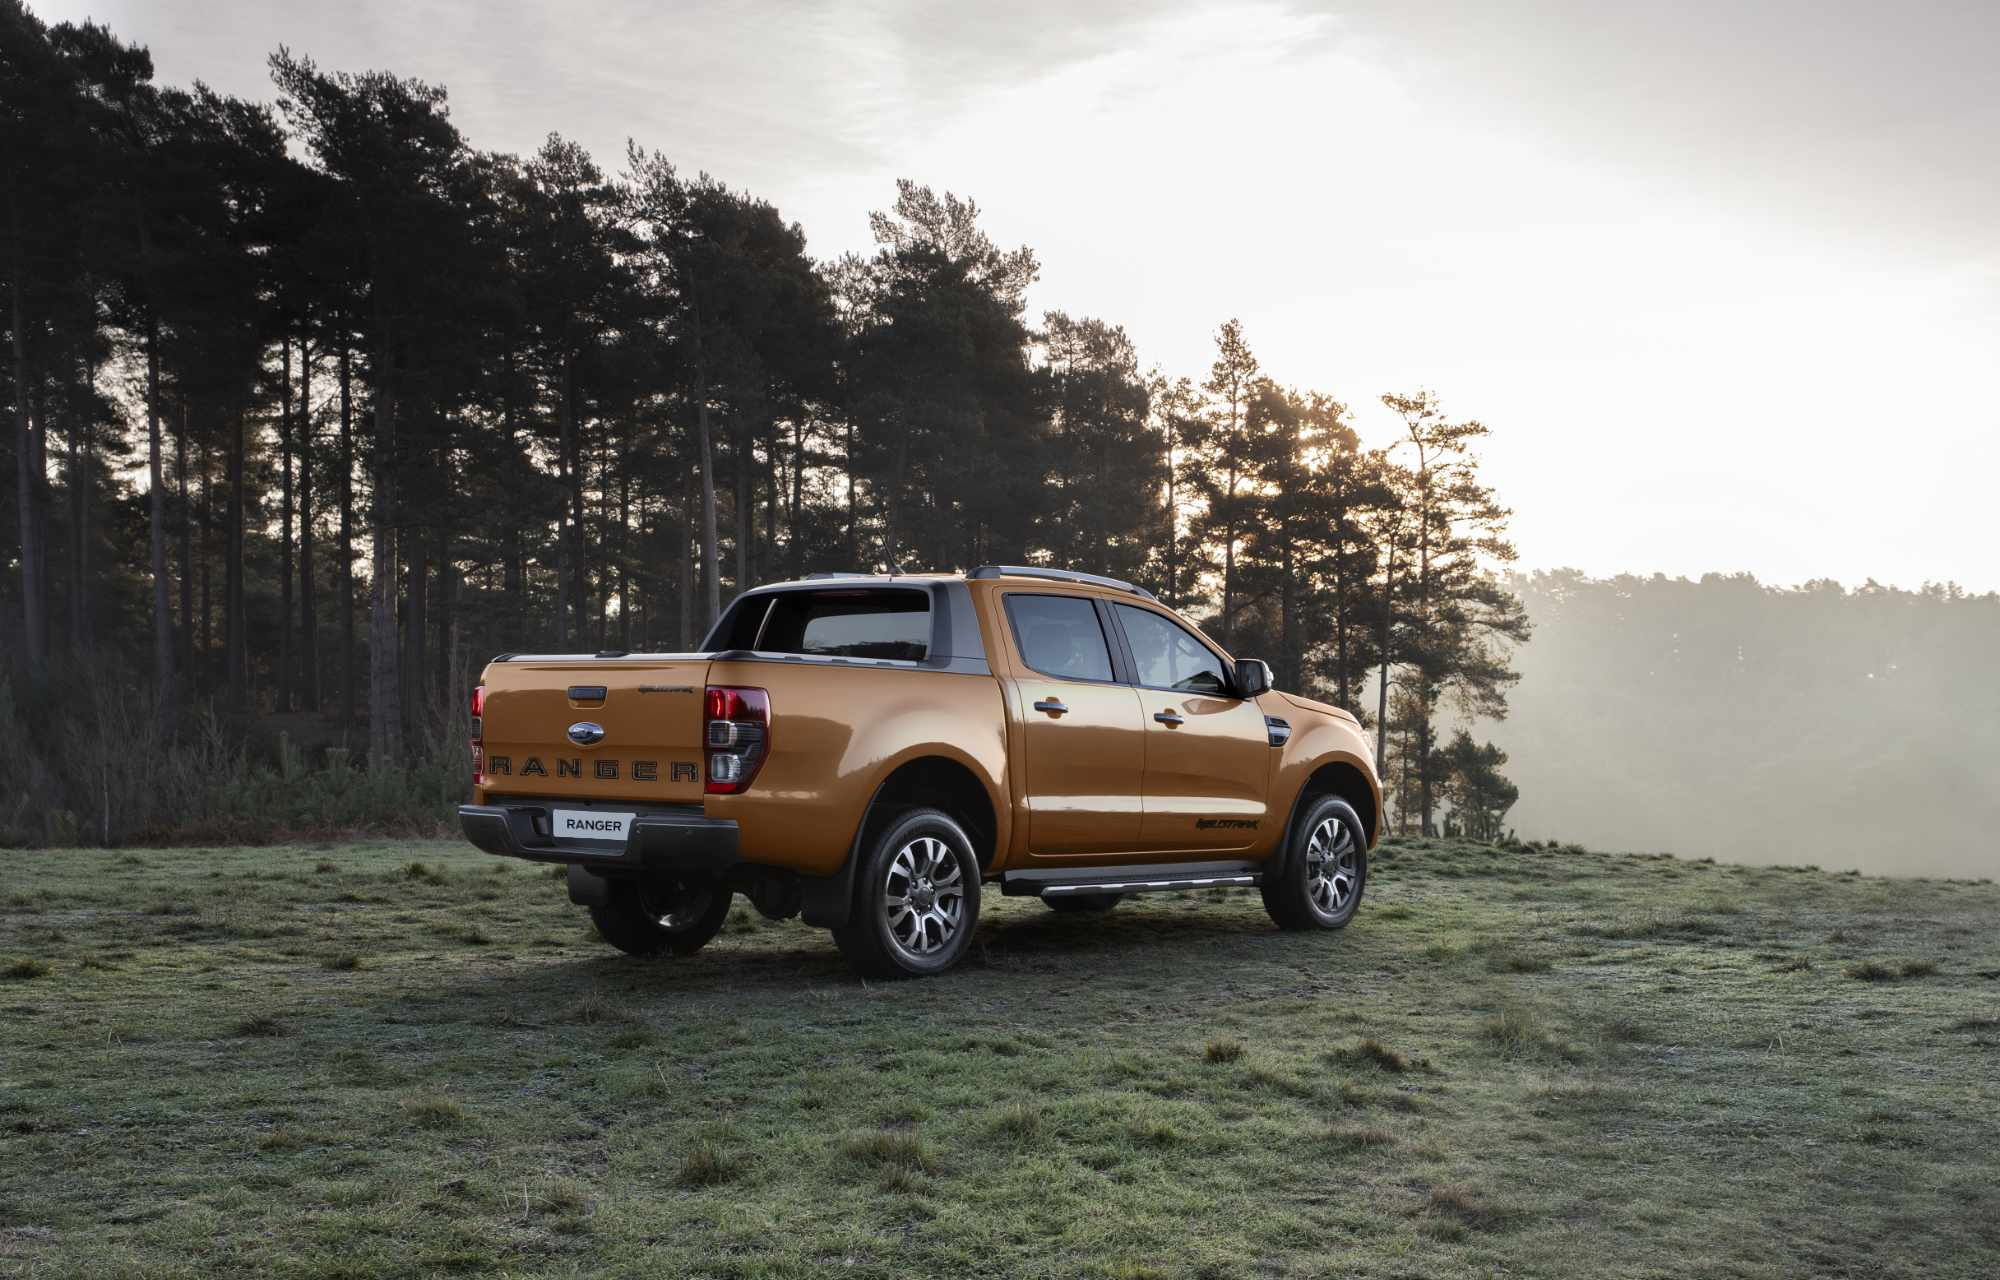 Ford Ranger at Finlay Ford